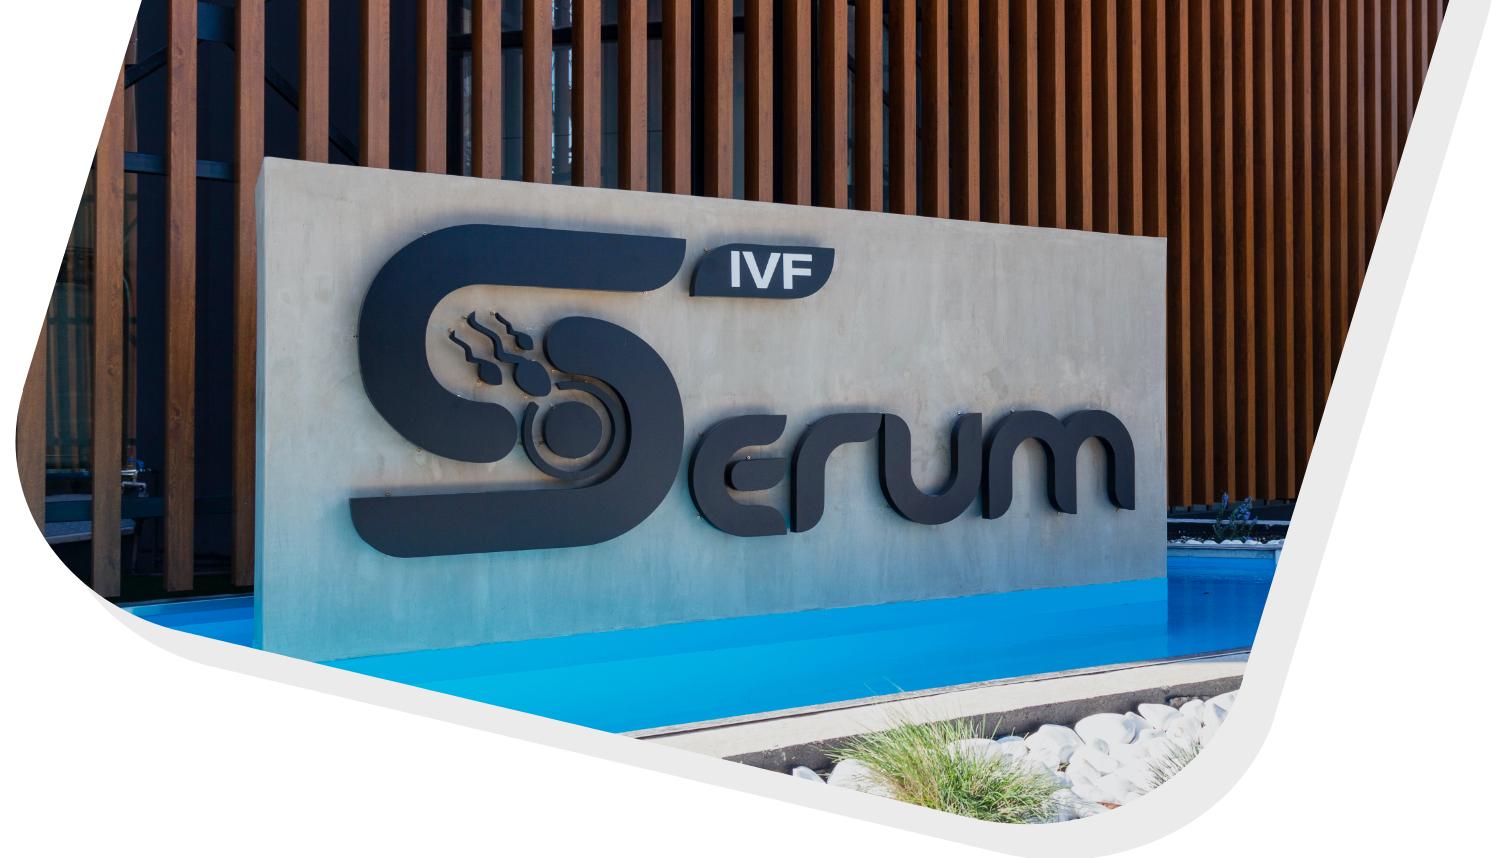 IVF Serum contact